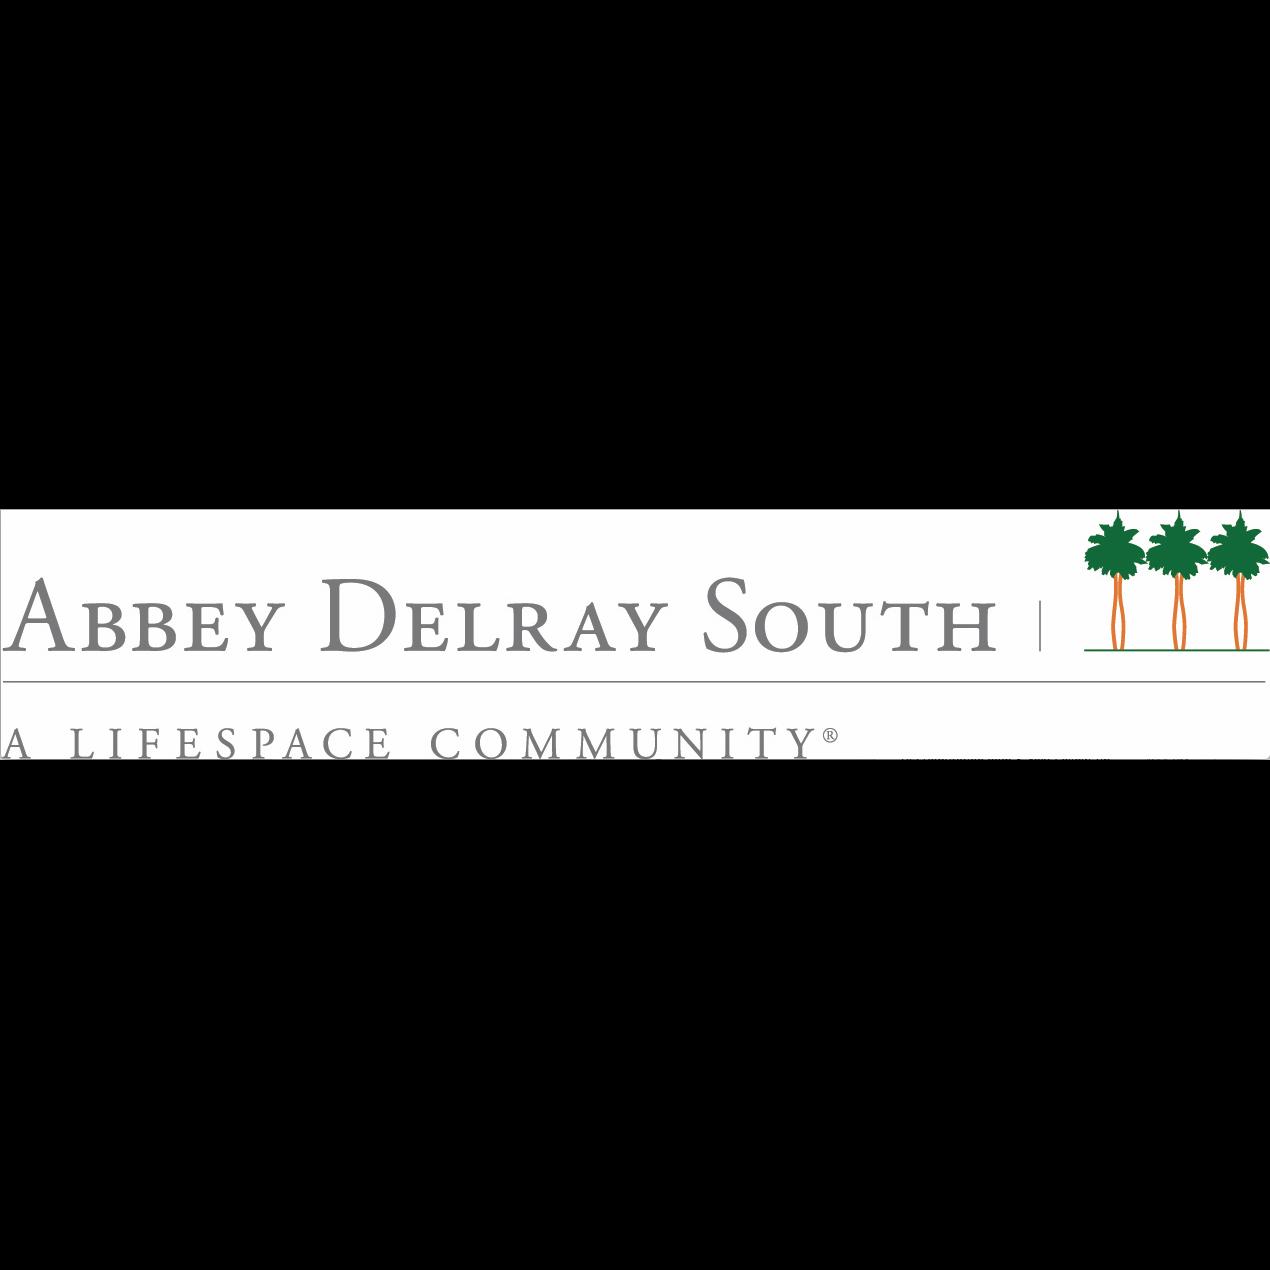 Abbey Delray South